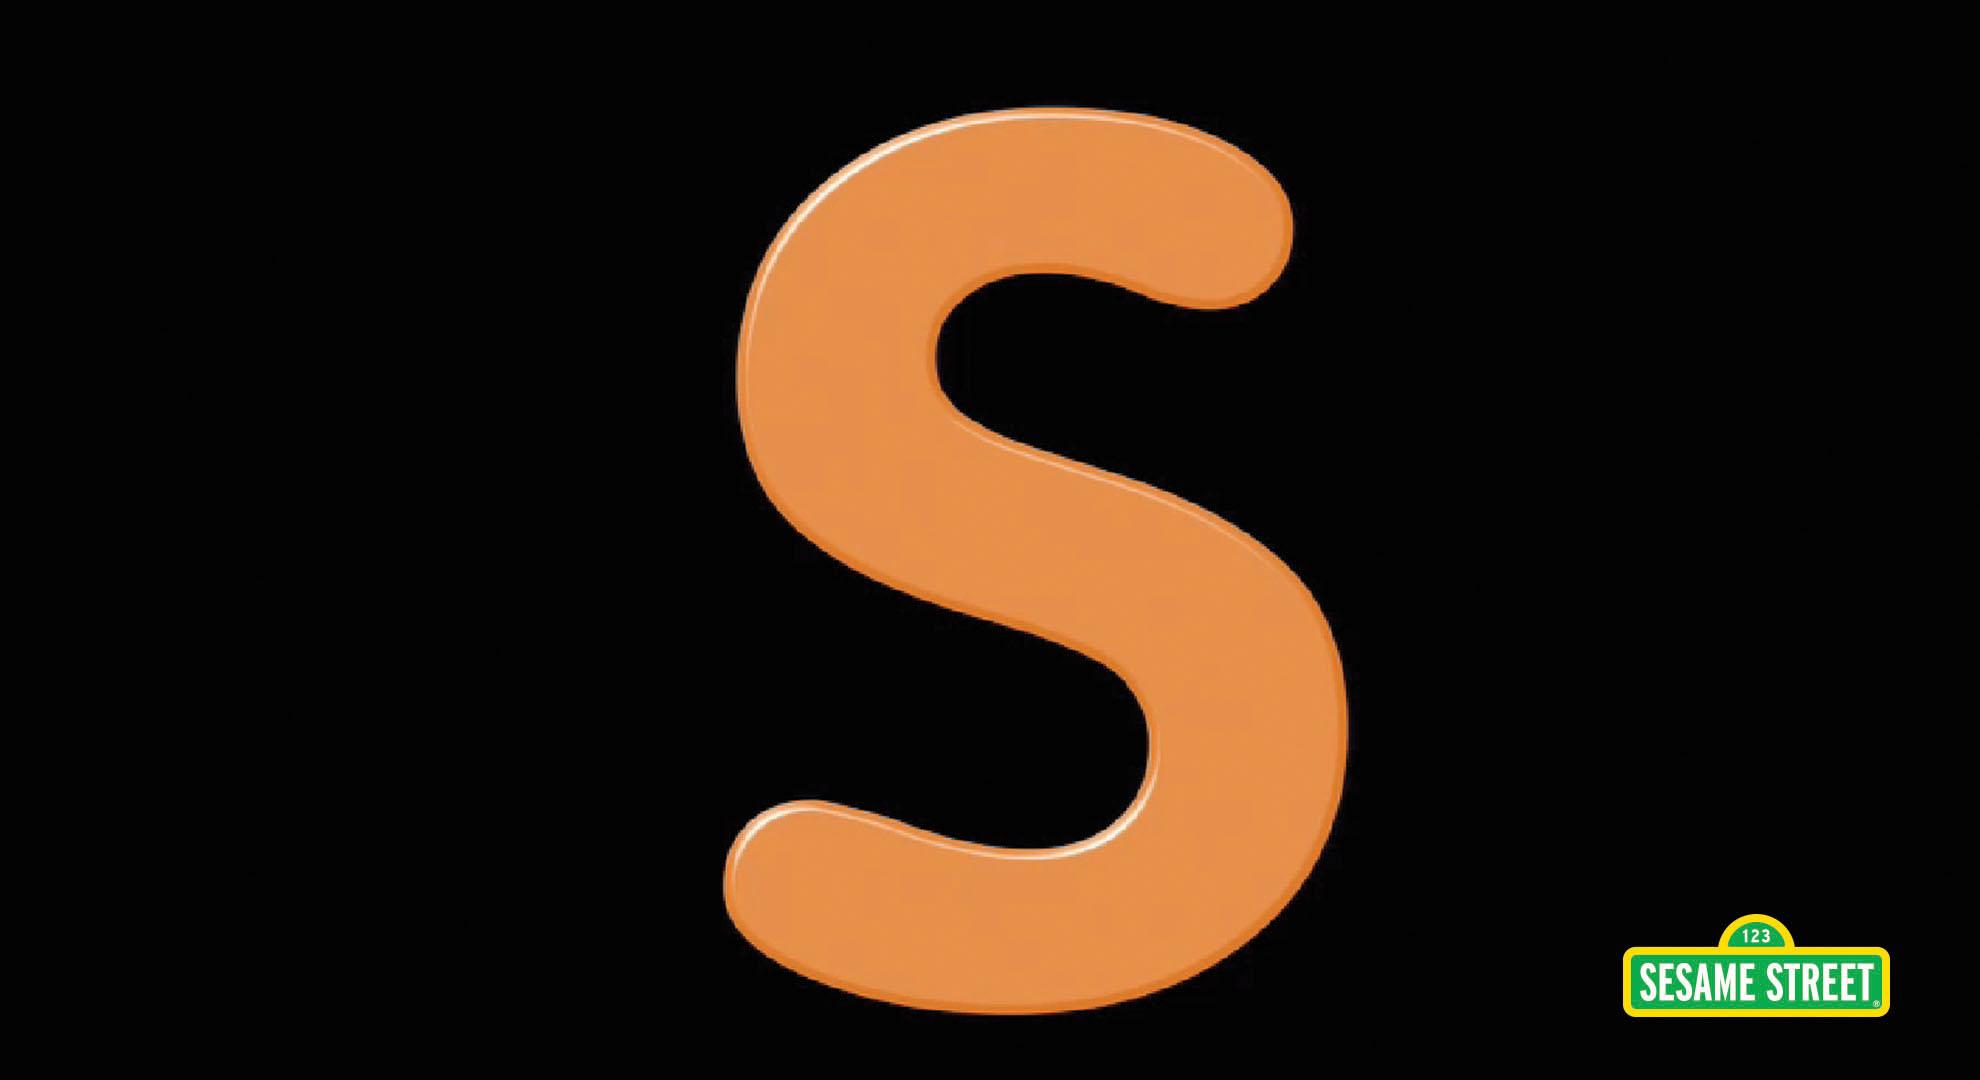 Song: Letter of the Day: S | Sesame Street